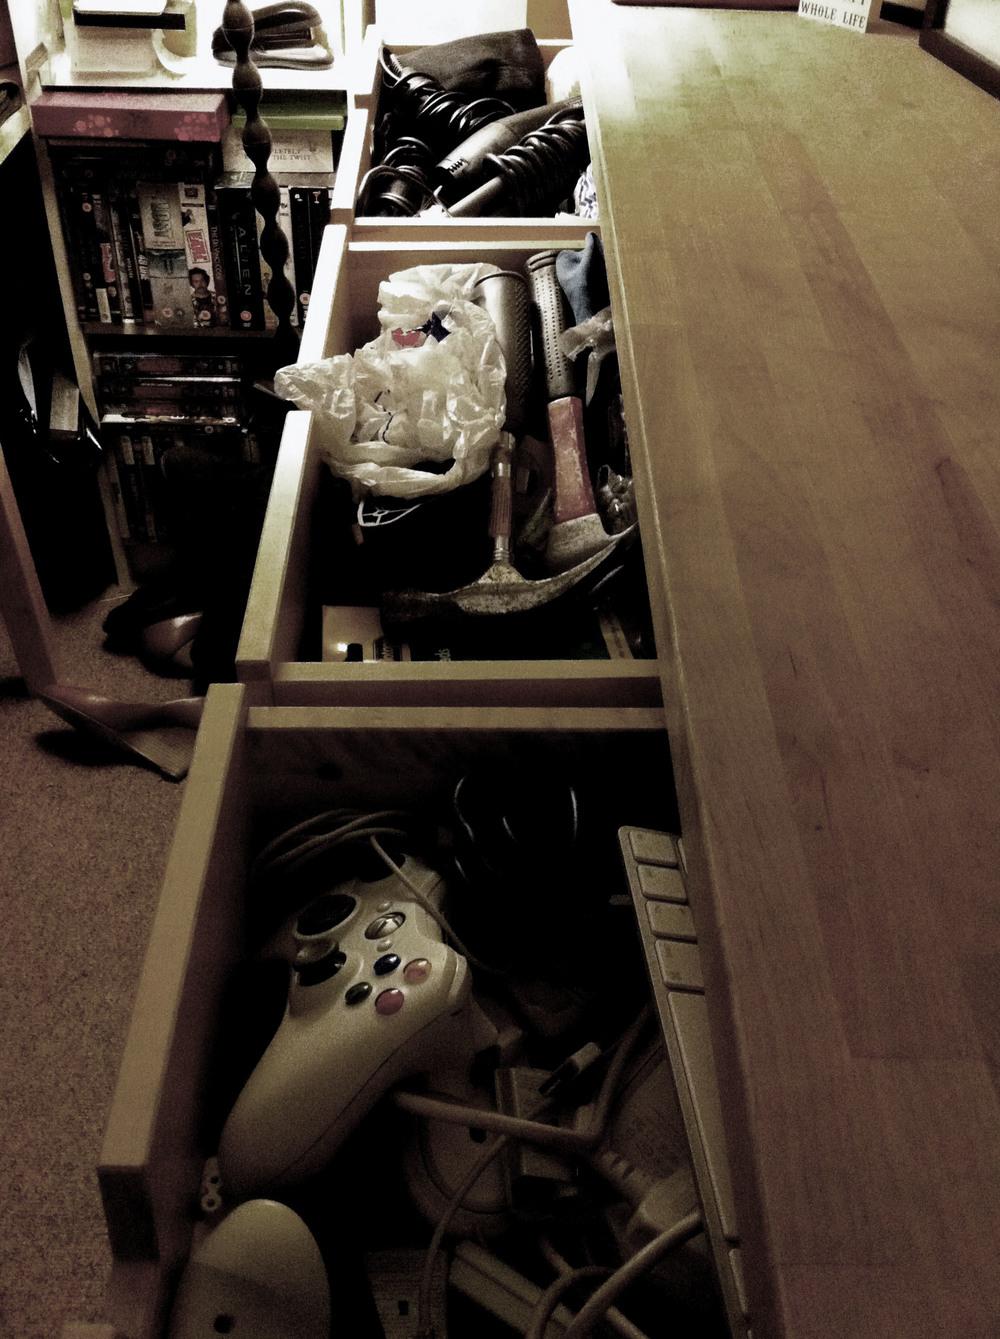 drawer clutter.jpg